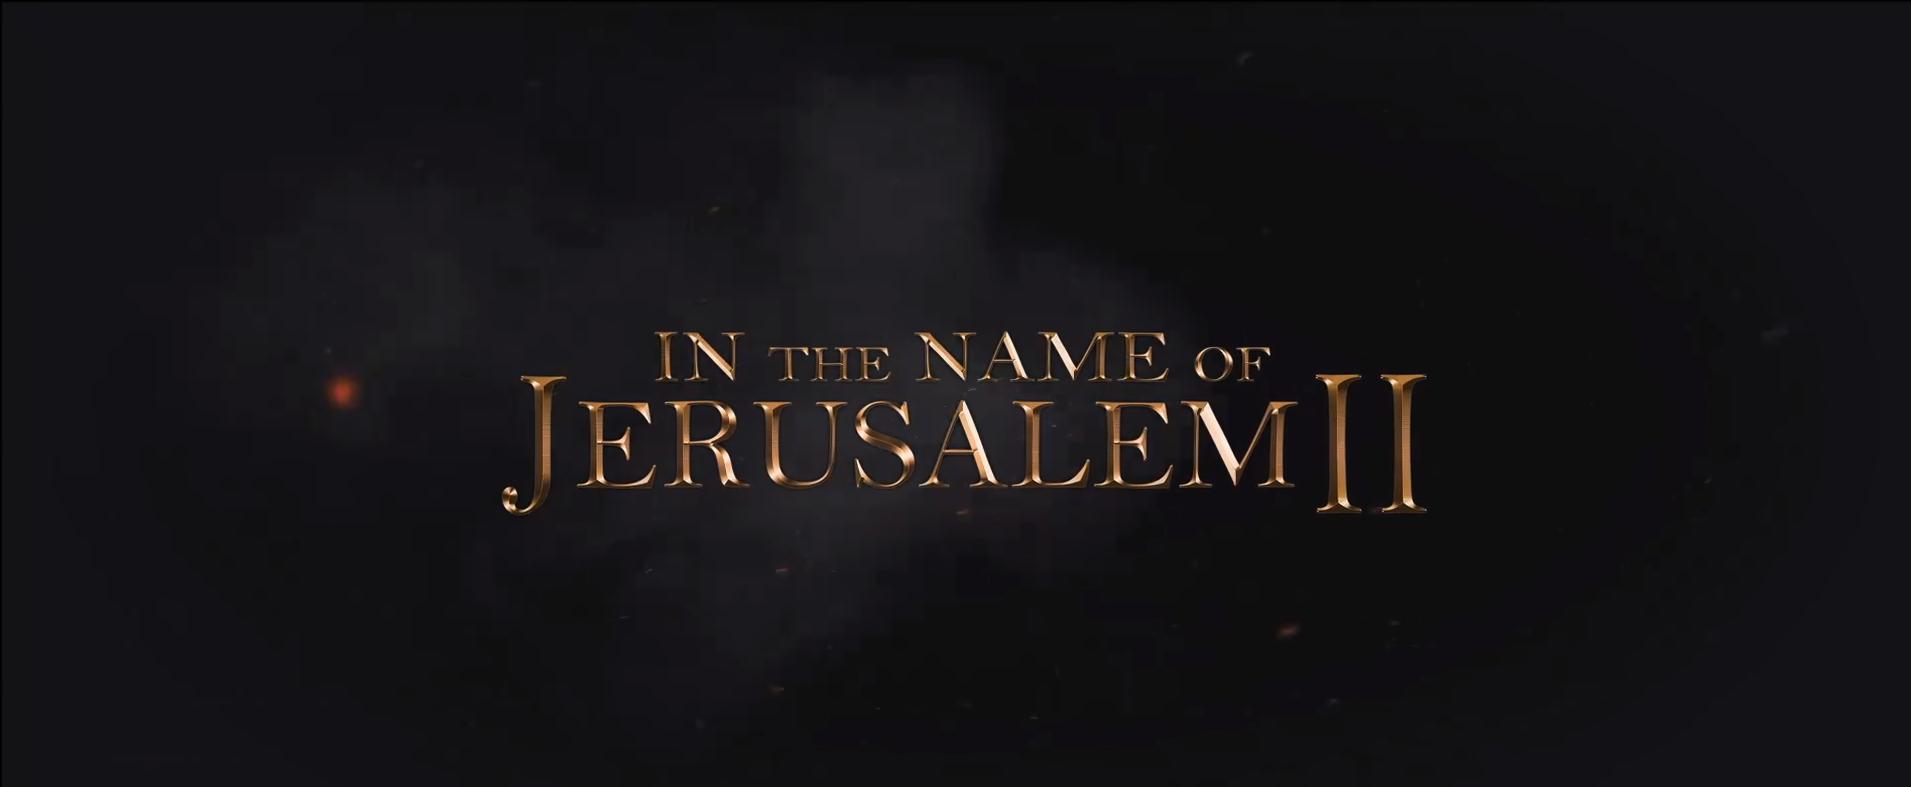 [SP] In the name of Jerusalem 2 Image